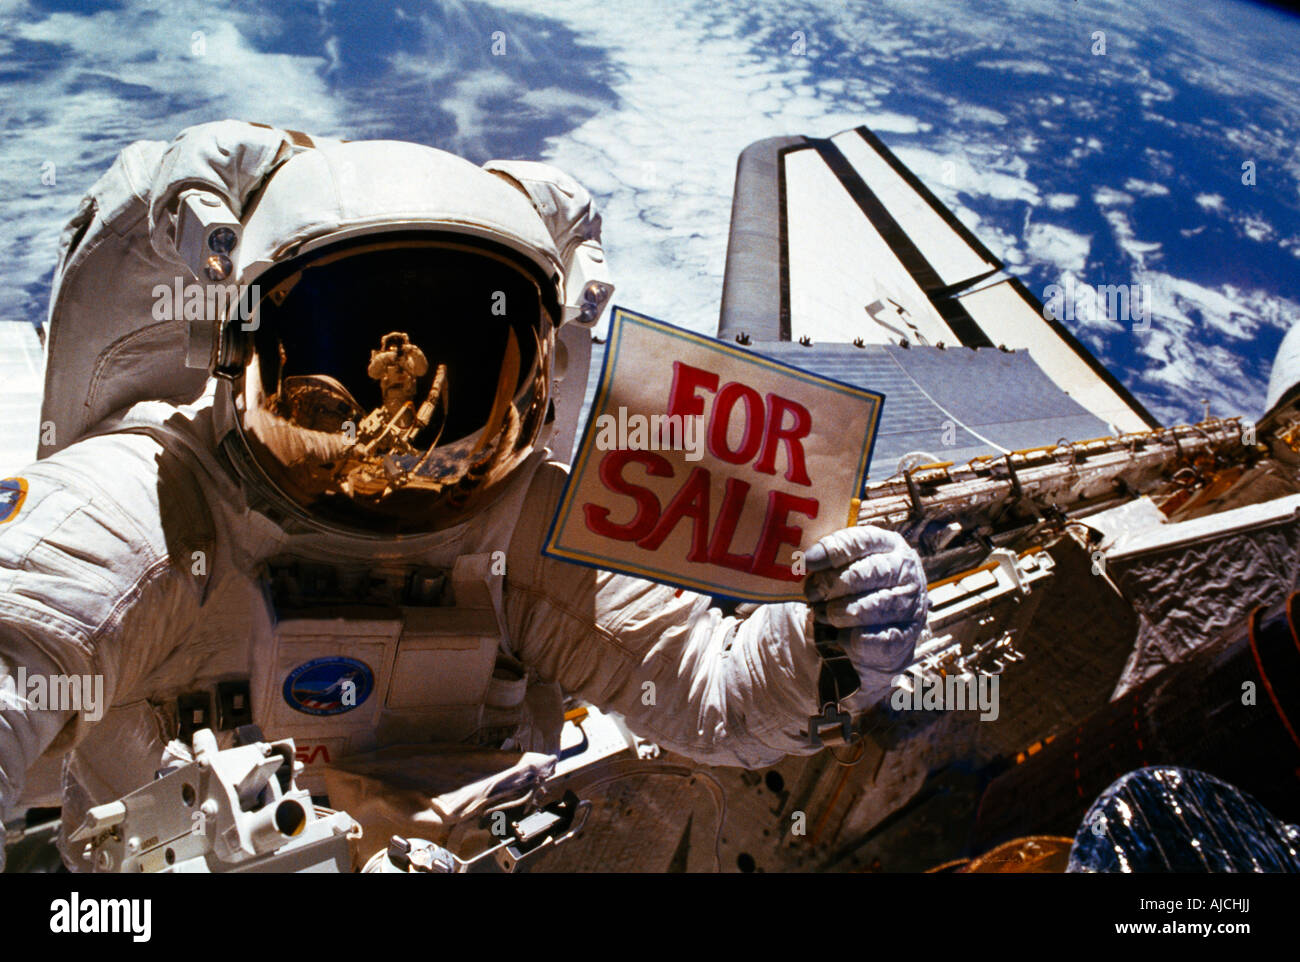 Astronauten im All mit Verkaufsschild Stockbild